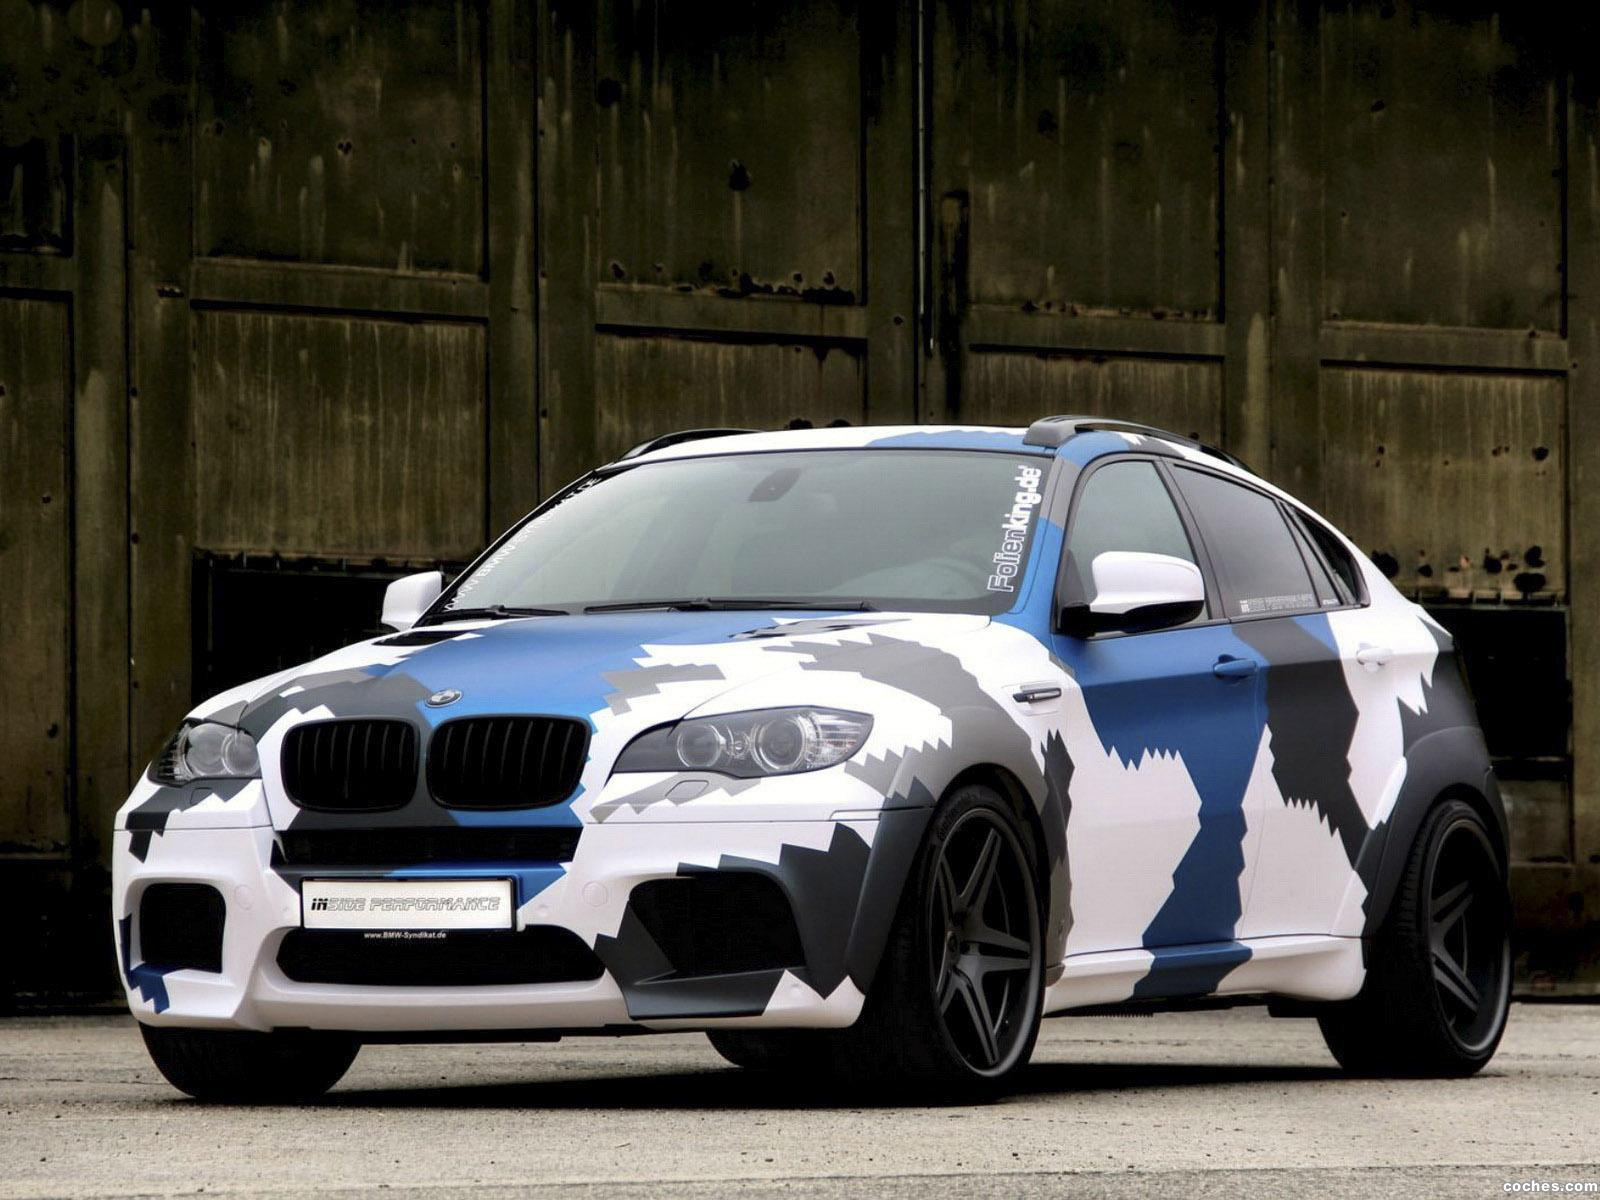 Foto 0 de BMW X6 M Stealth By Inside Performance E71 2013